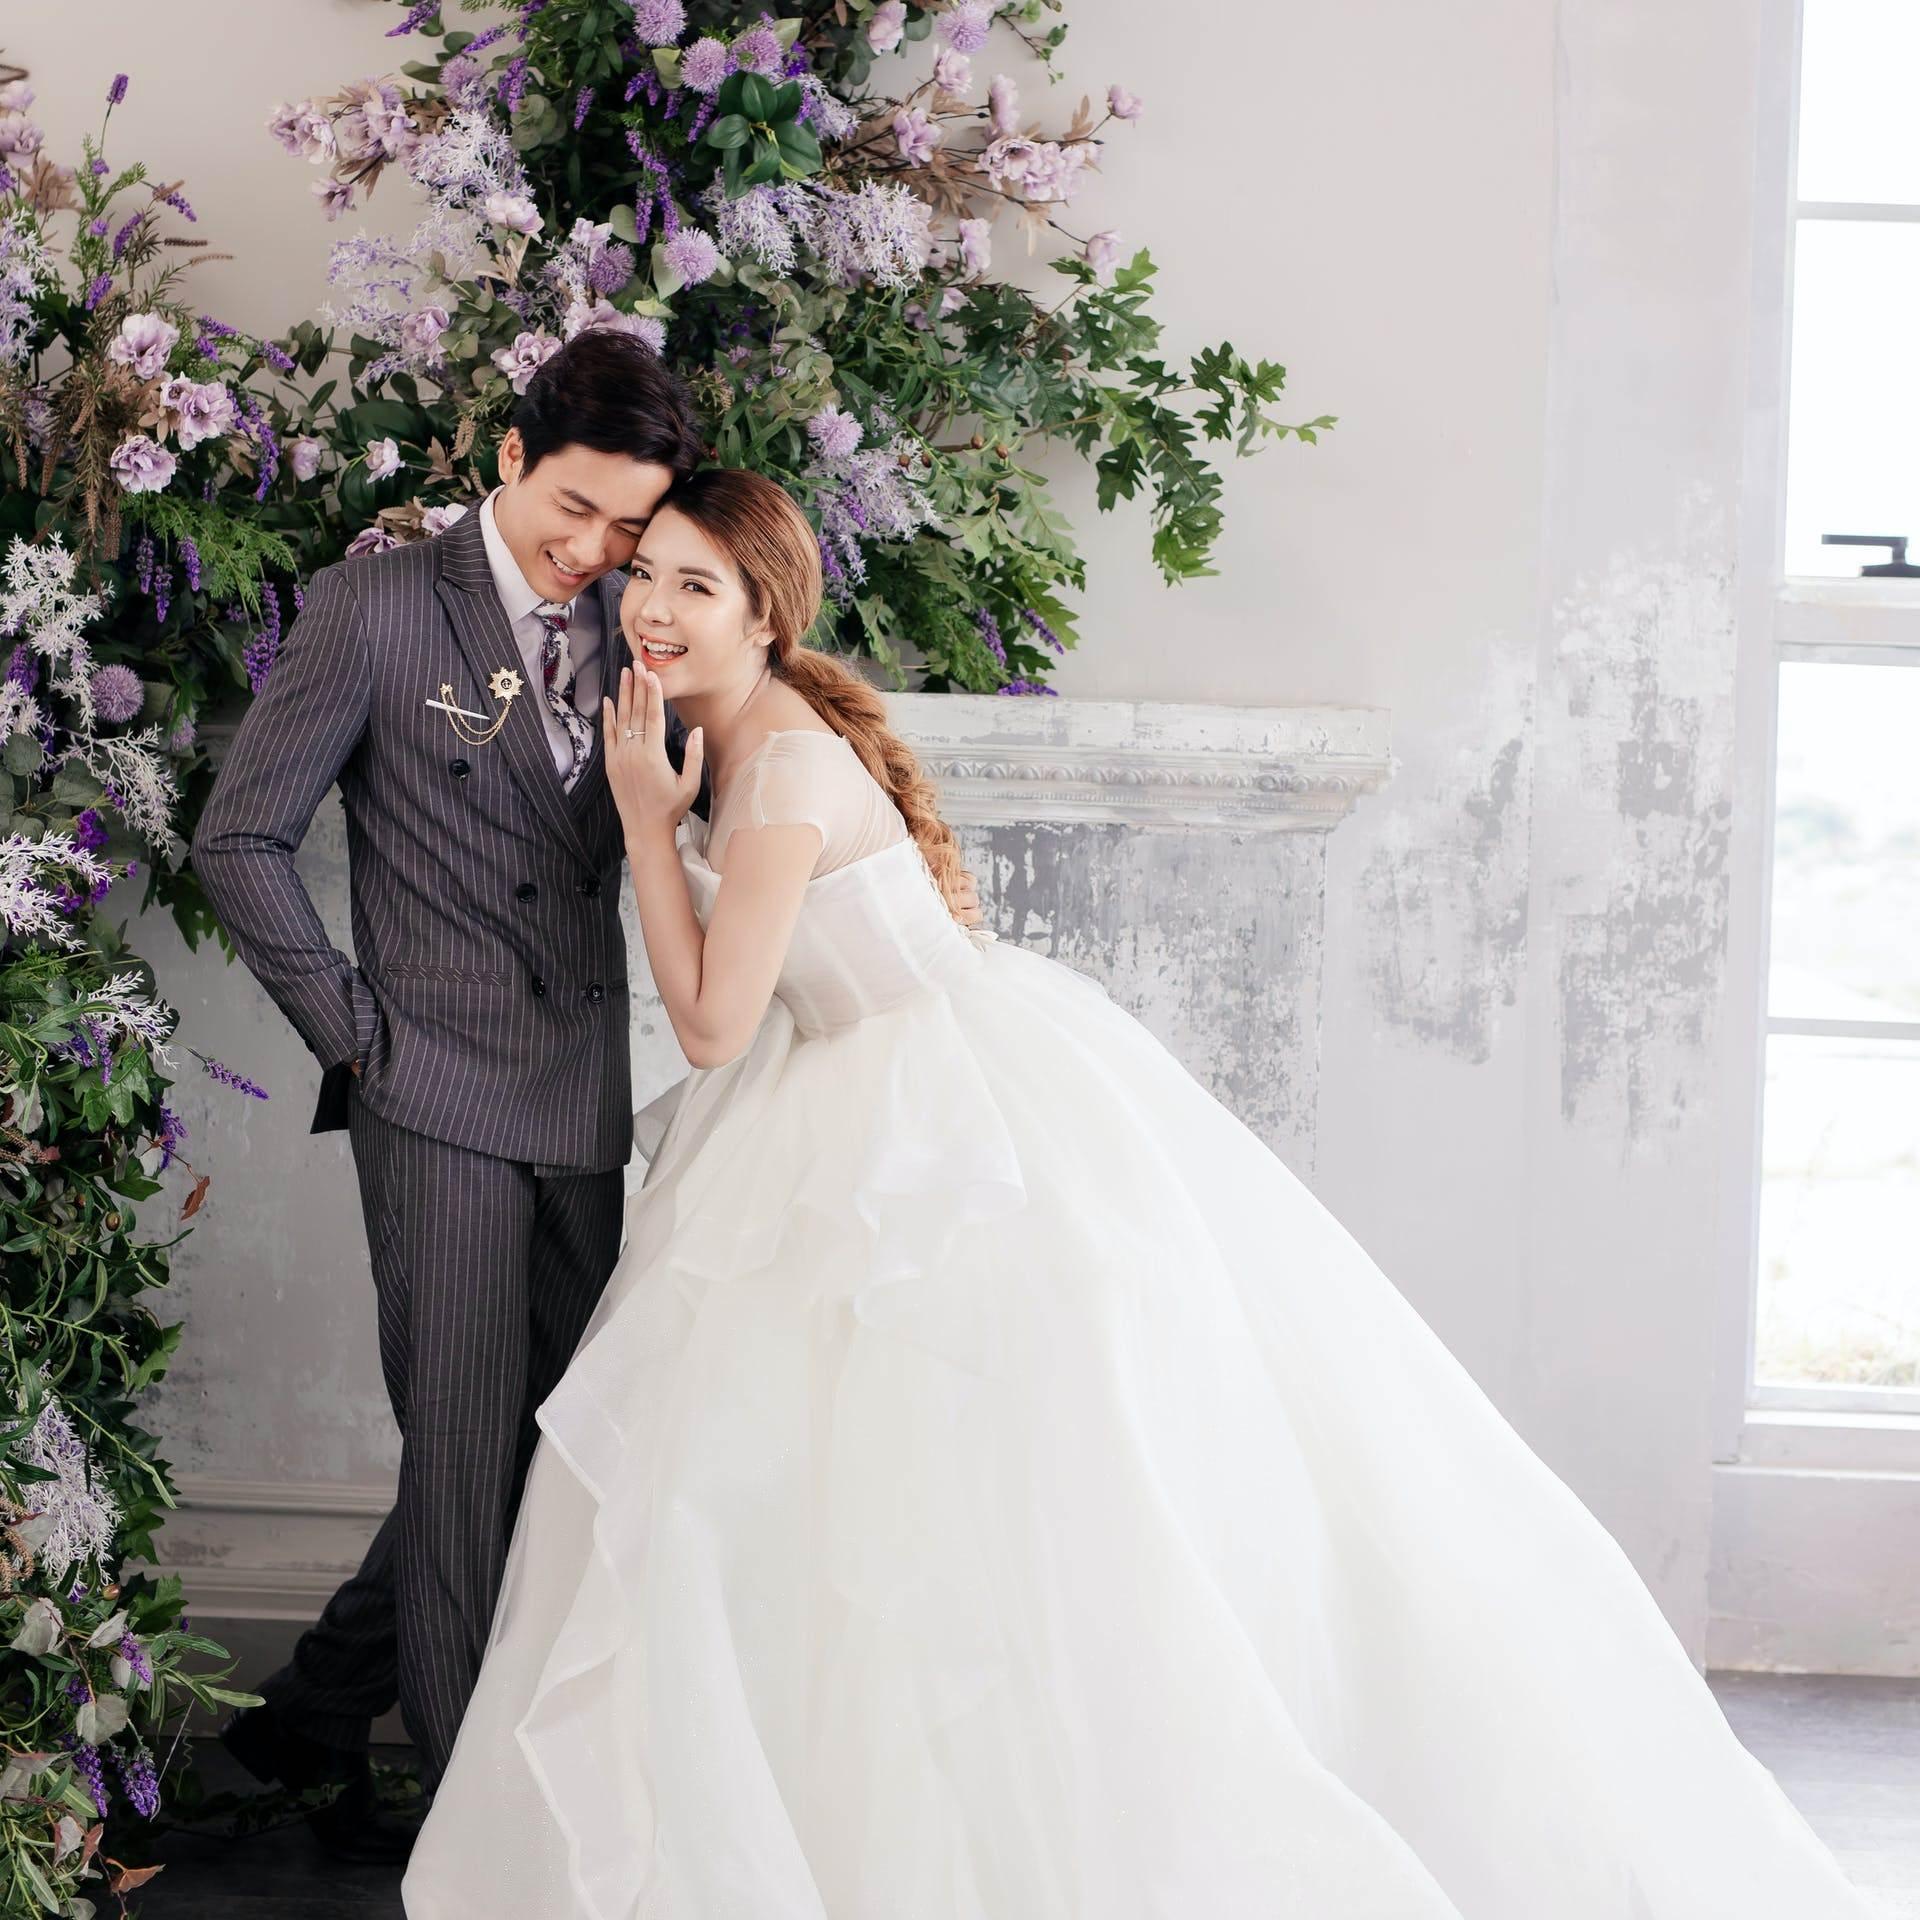 Wedding-Dresses-3295